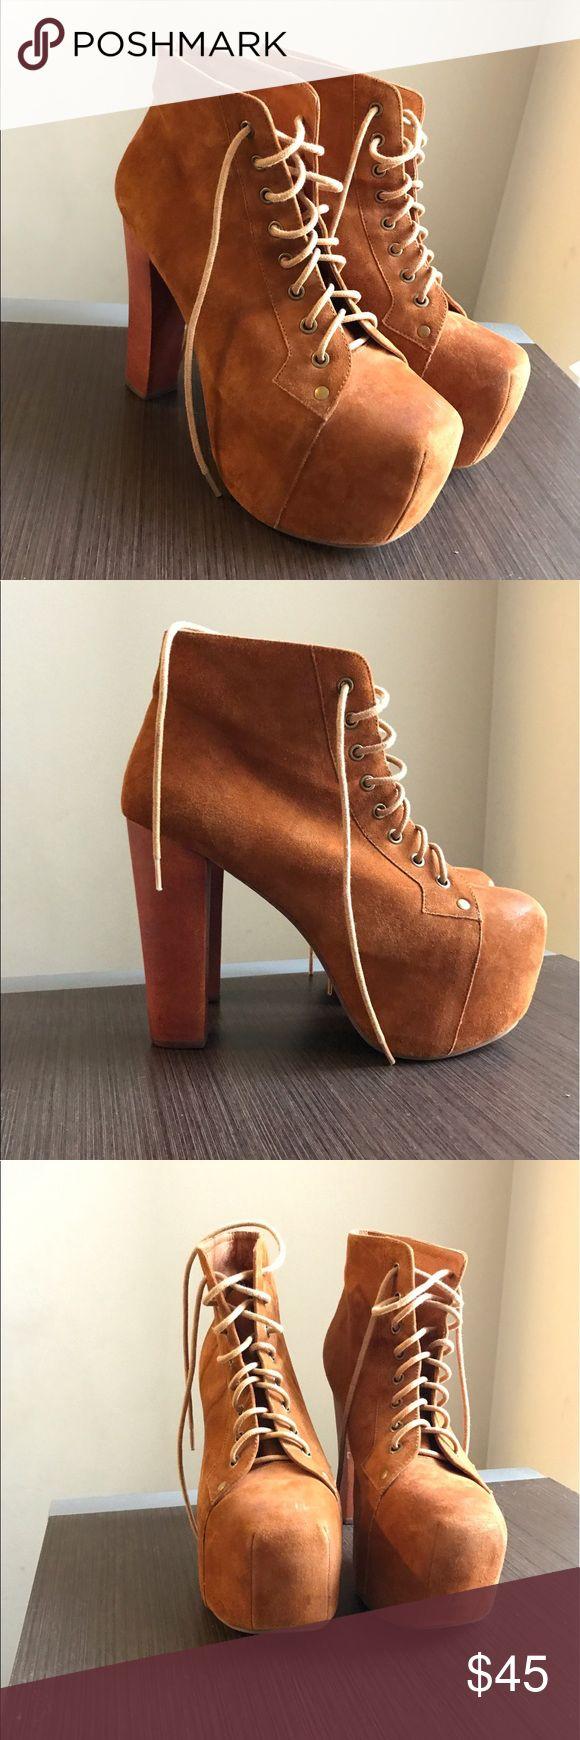 Jeffrey Campbell Lita Boot Camel suede Jeffrey Campbell Litas! Only worn a few times so